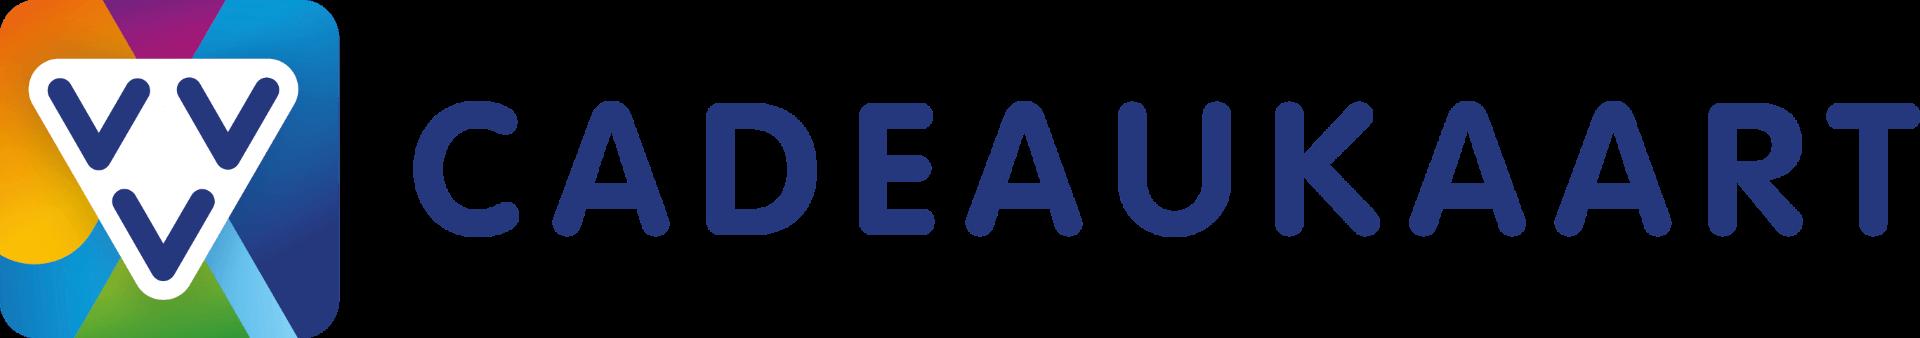 170905-vvvcadeaubonnen-beeldbank-vvvcadeaukaart-logo-horizontaal-kattenherplaatsing